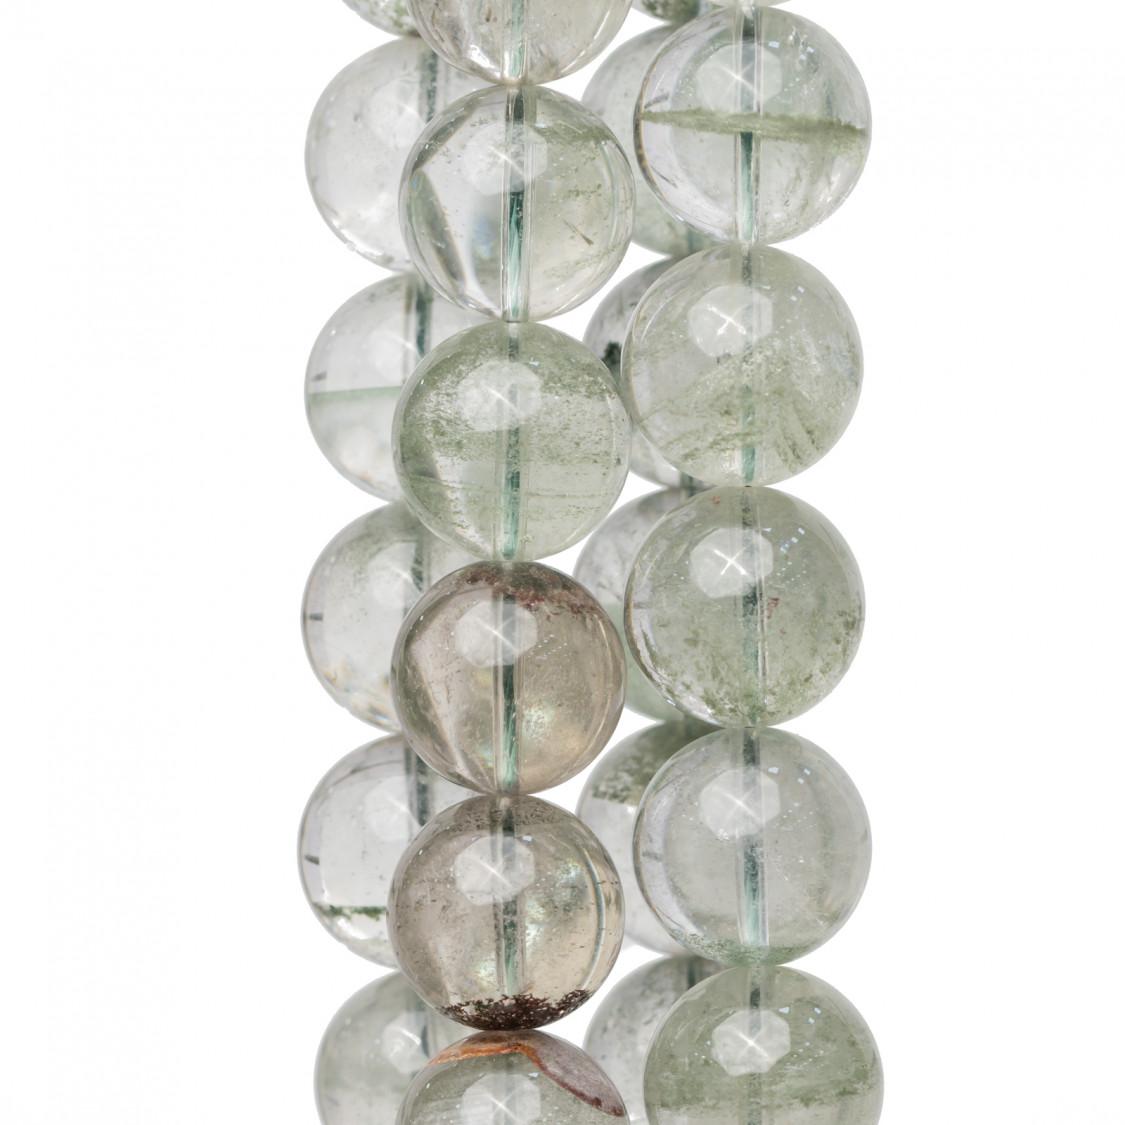 Buste di Plastica Adesive 12cm 100pz